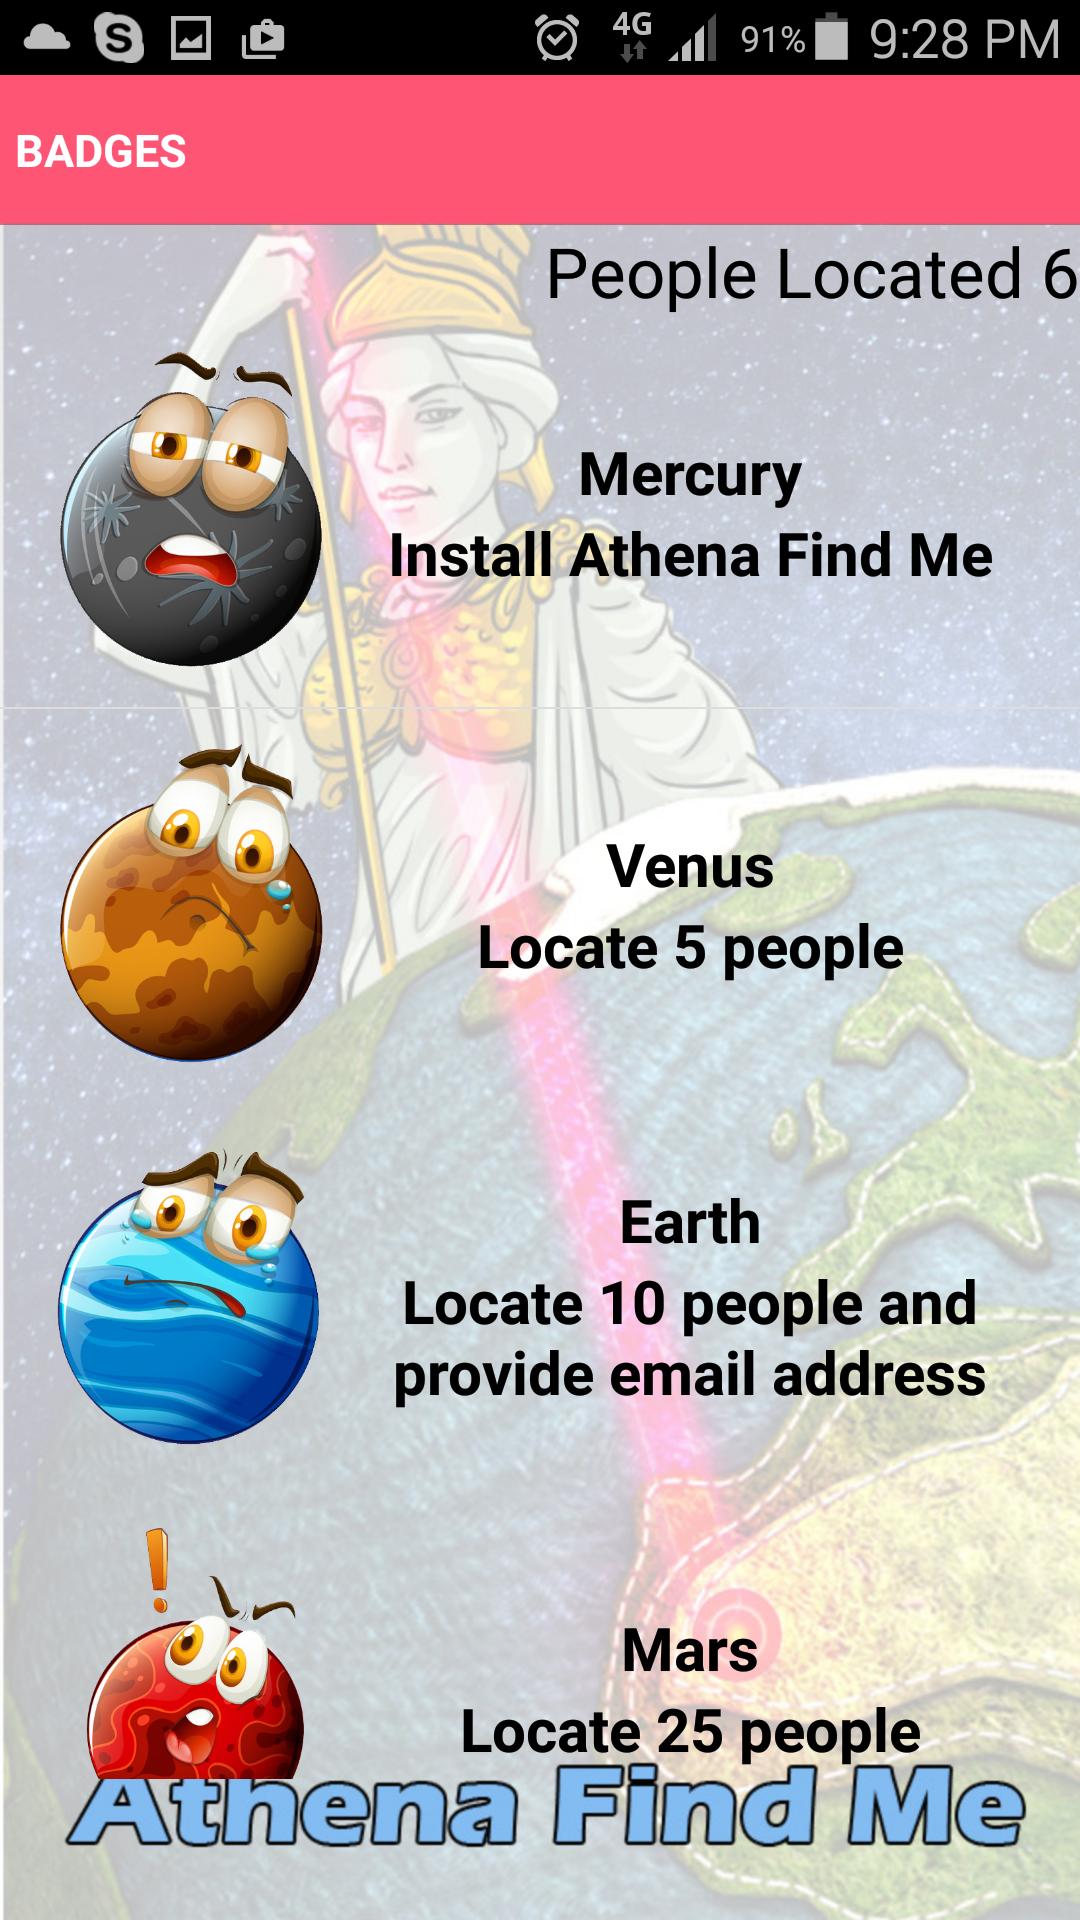 athena-find-me-2